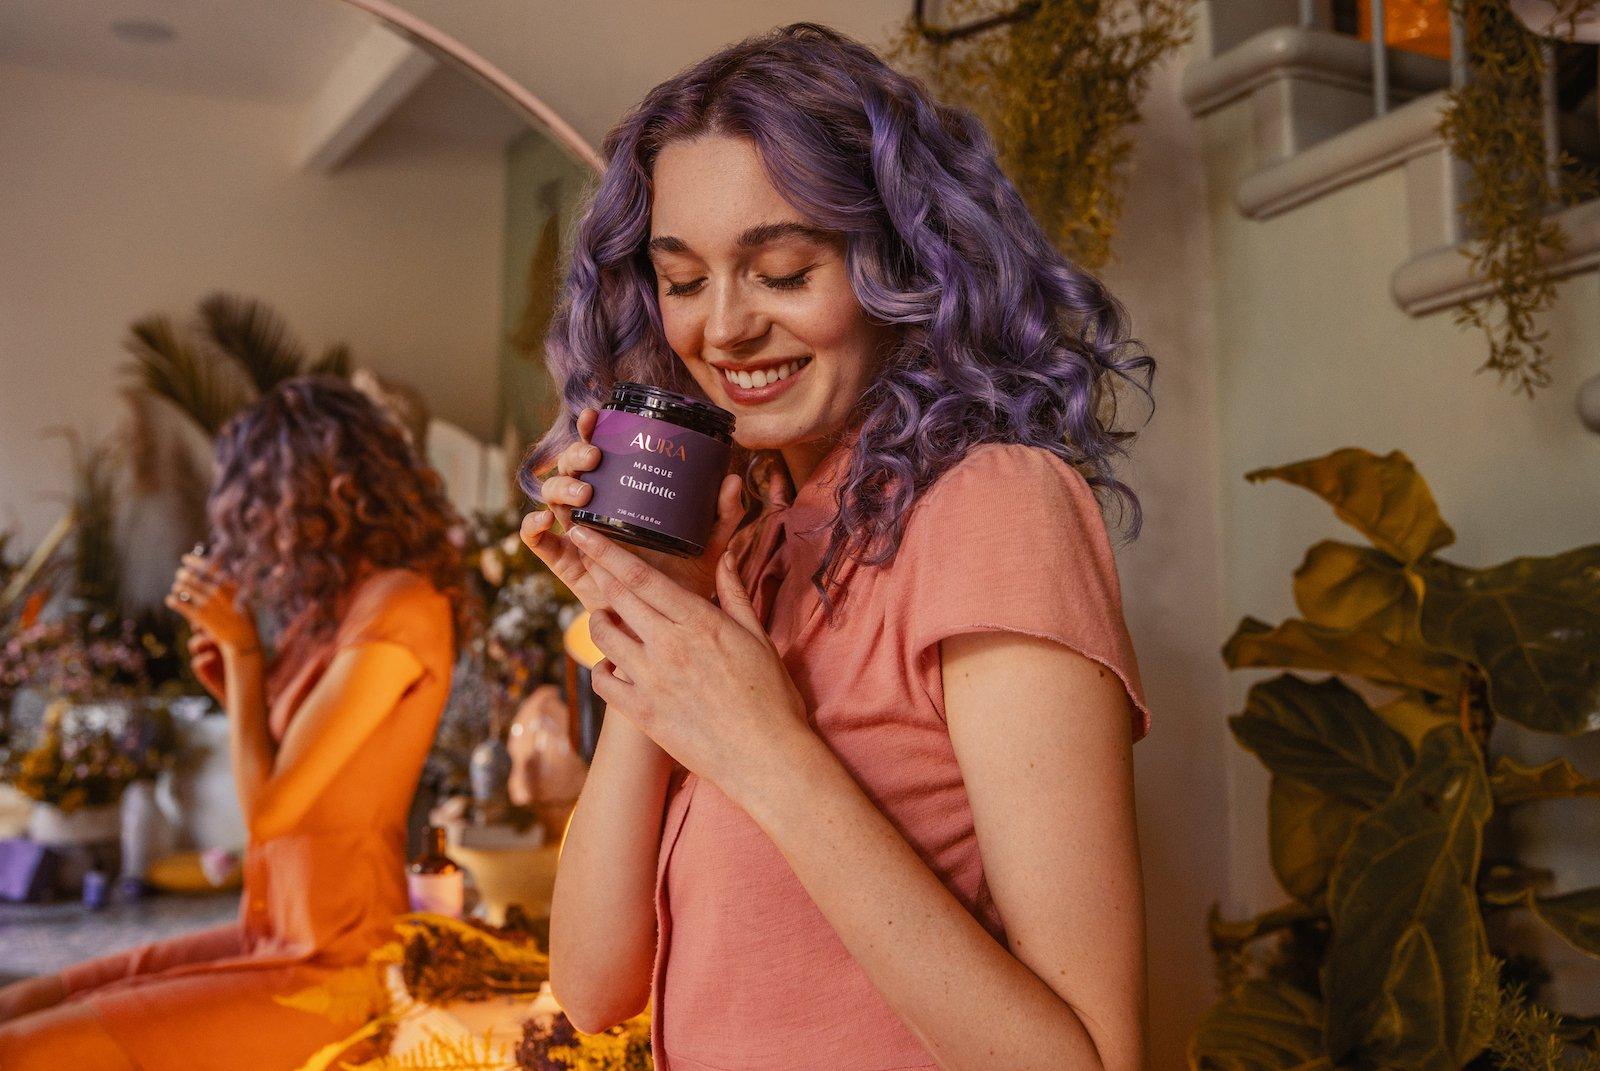 AURA French Lavender Pigment